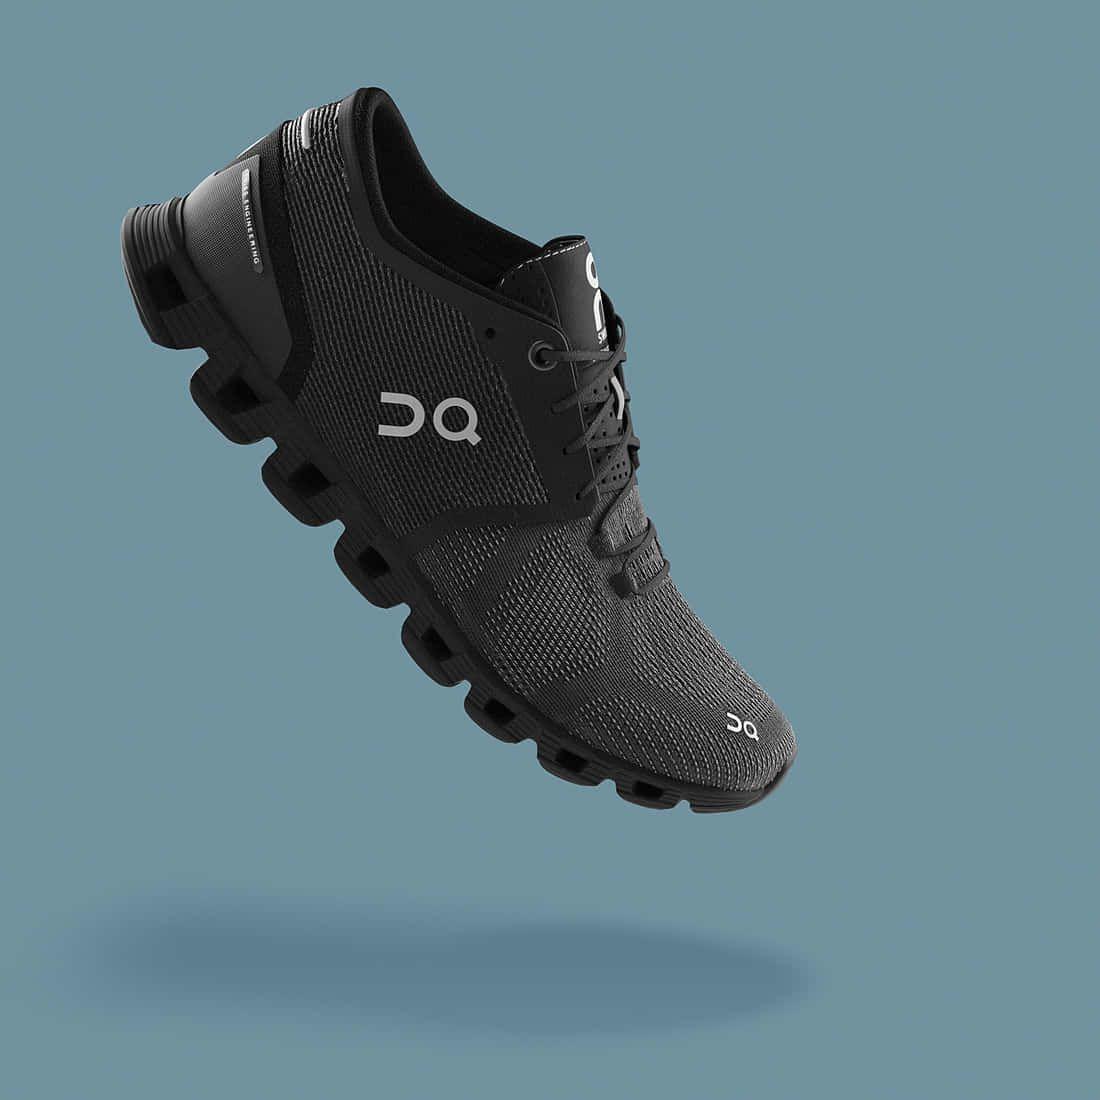 On Cloud Leichter Laufschuh Herren On Trainingsschuhe Fitness Schuhe Leichte Laufschuhe